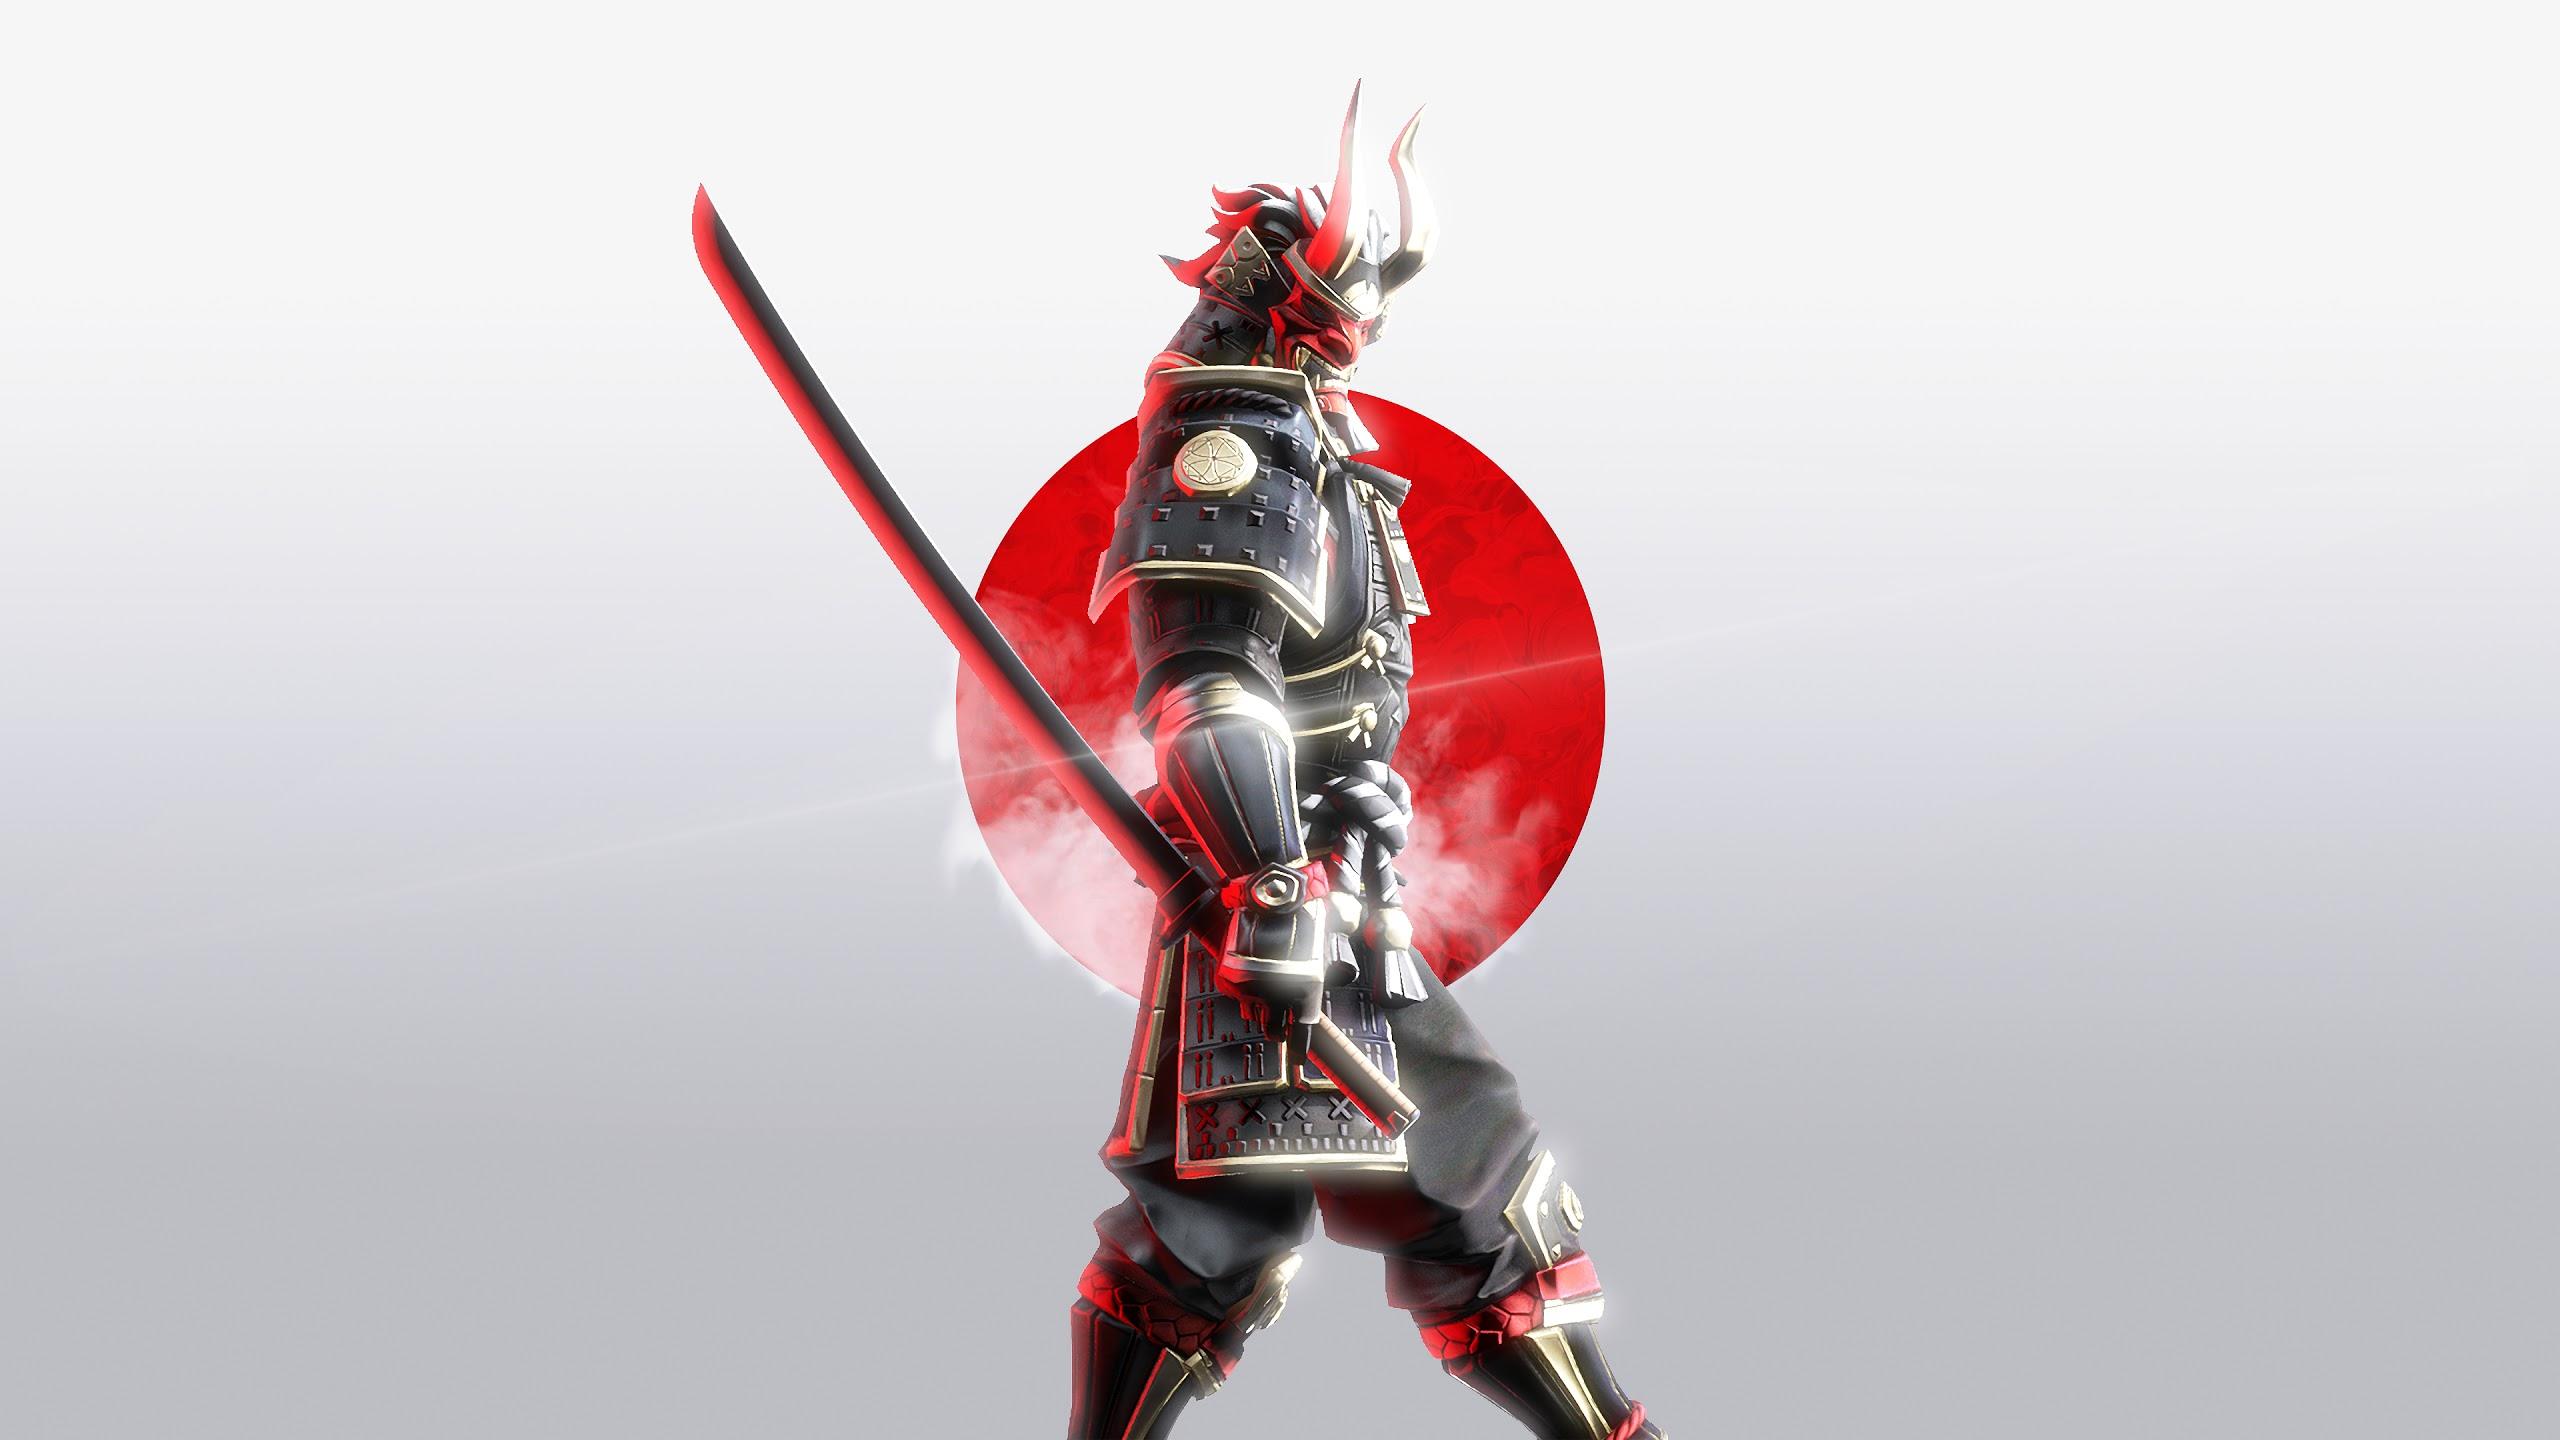 Fortnite Shogun 4K Wallpaper 178 2560x1440